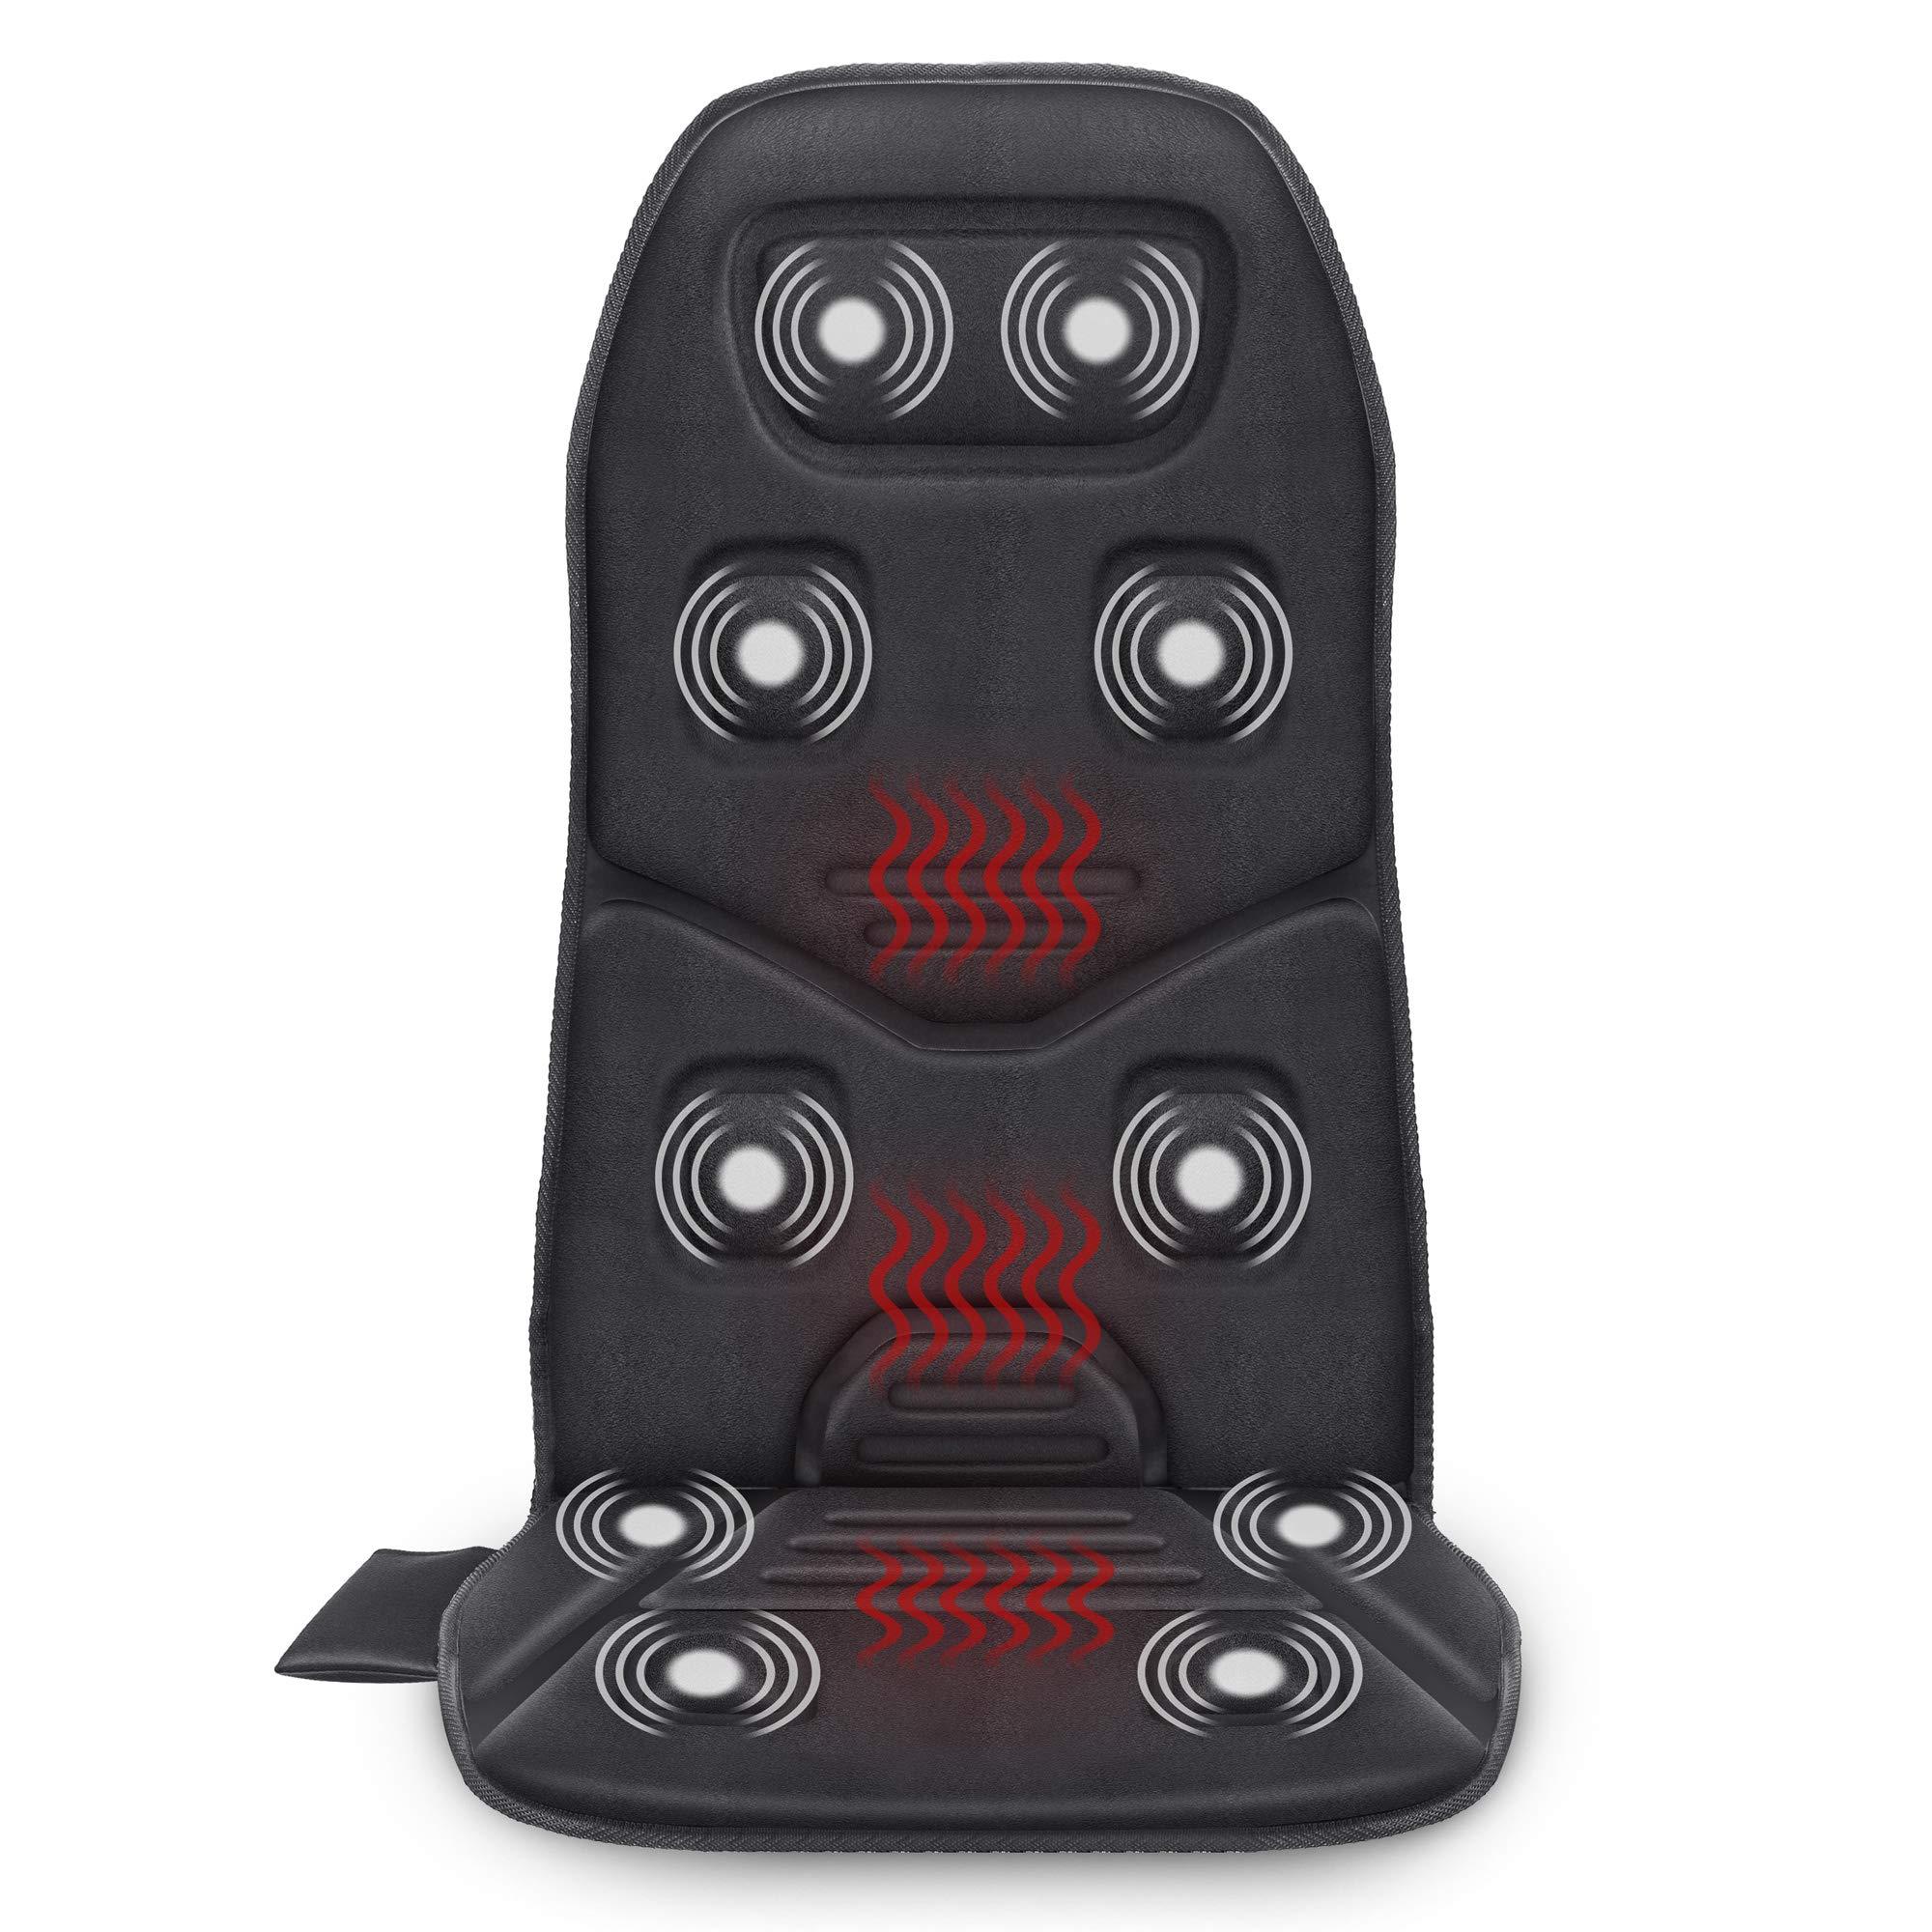 Comfier Massage Seat Cushion Heat